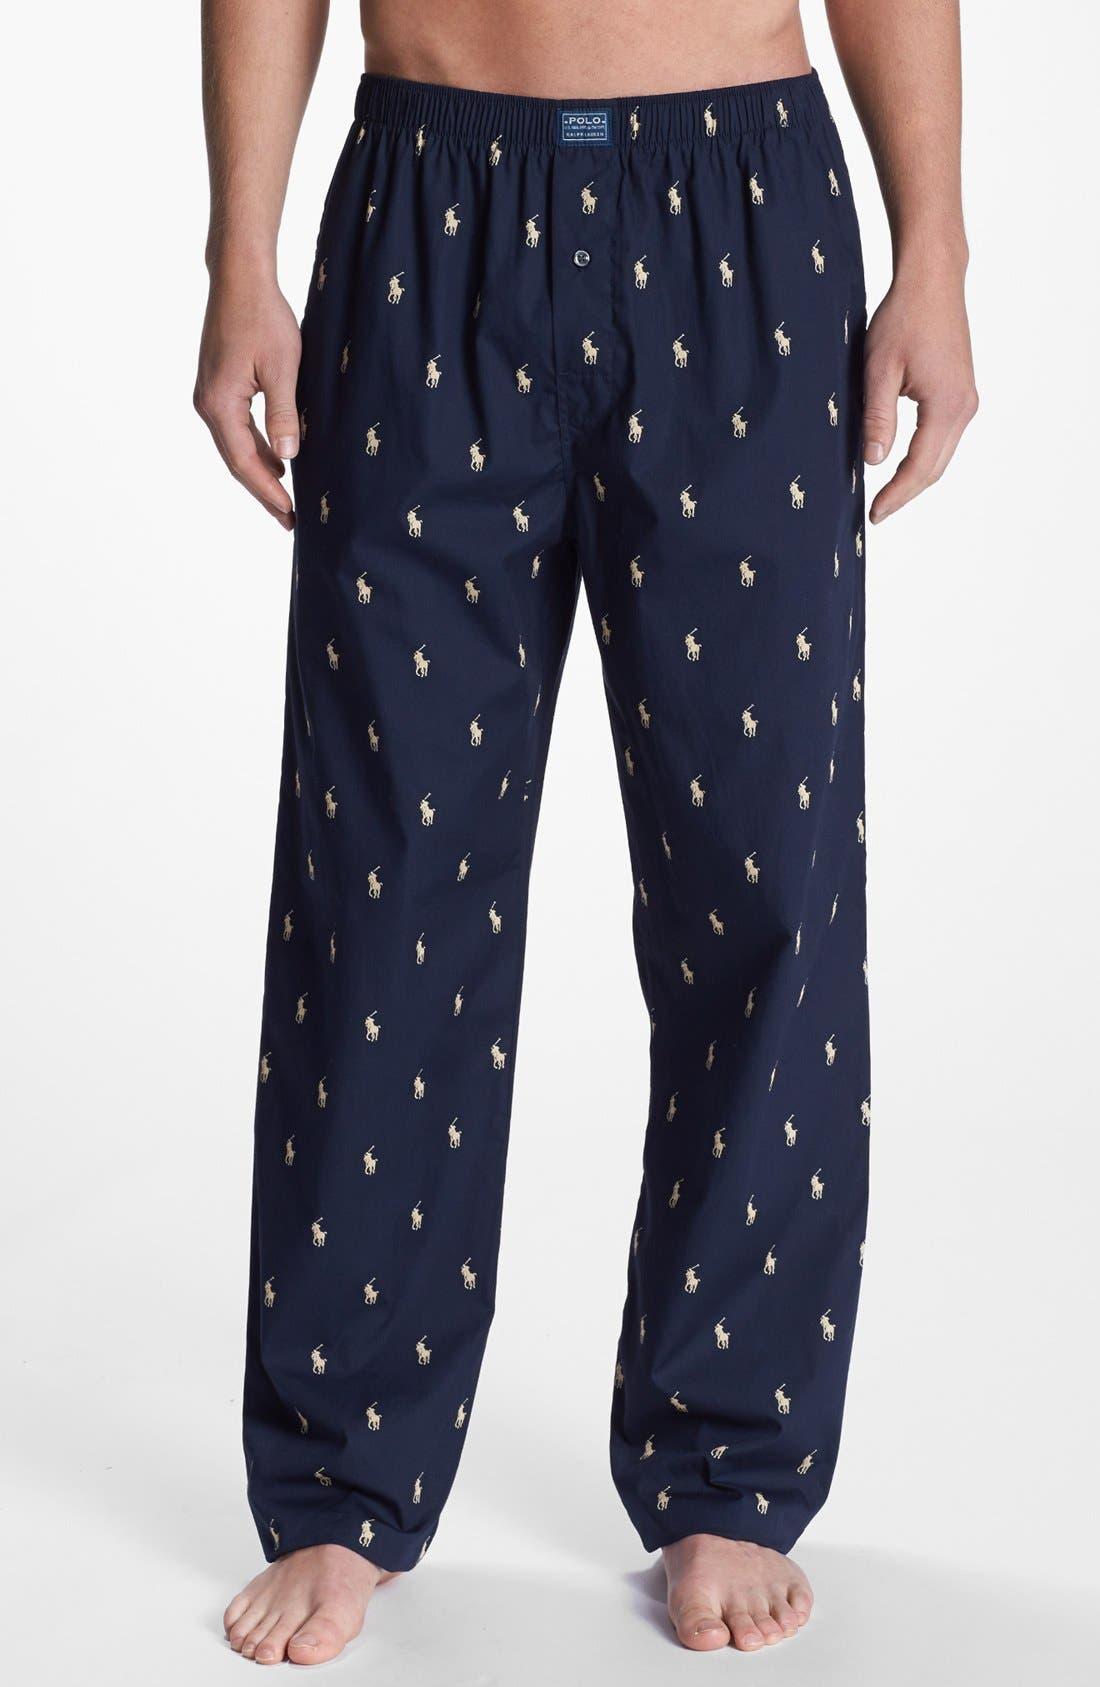 Cotton Lounge Pants,                             Main thumbnail 1, color,                             Navy/ White